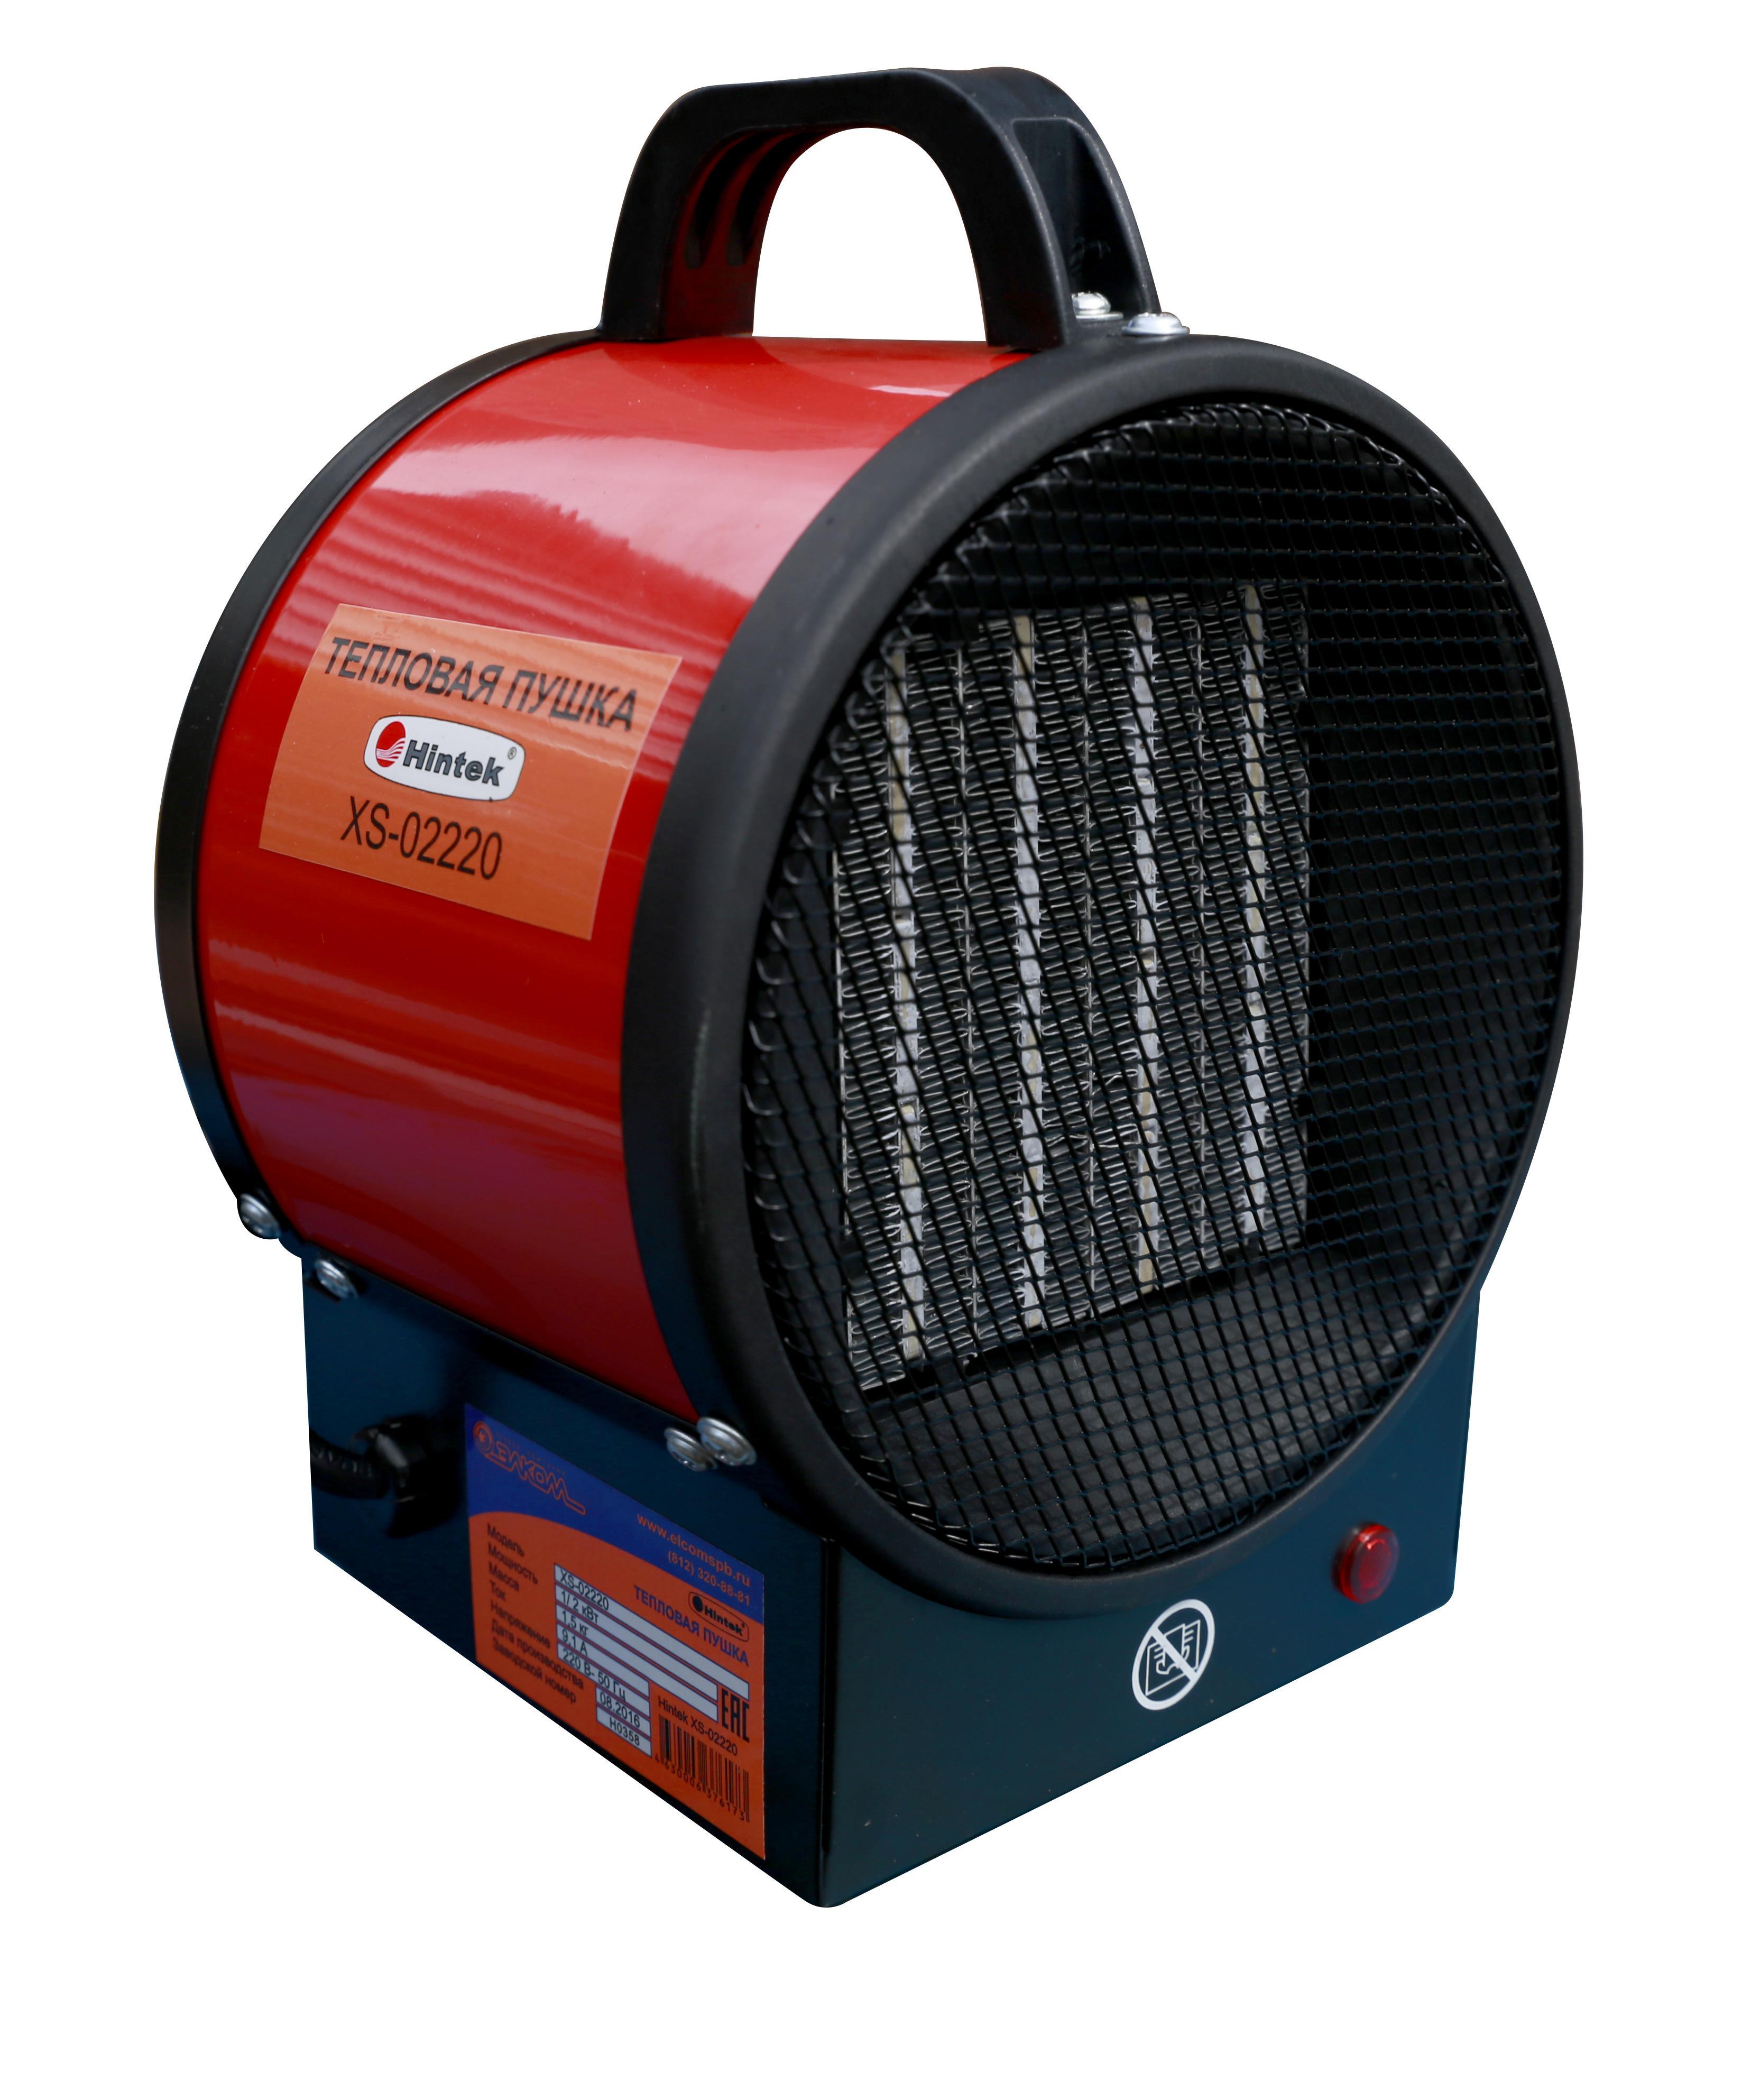 Тепловентилятор Hintek Xs-02220 все цены